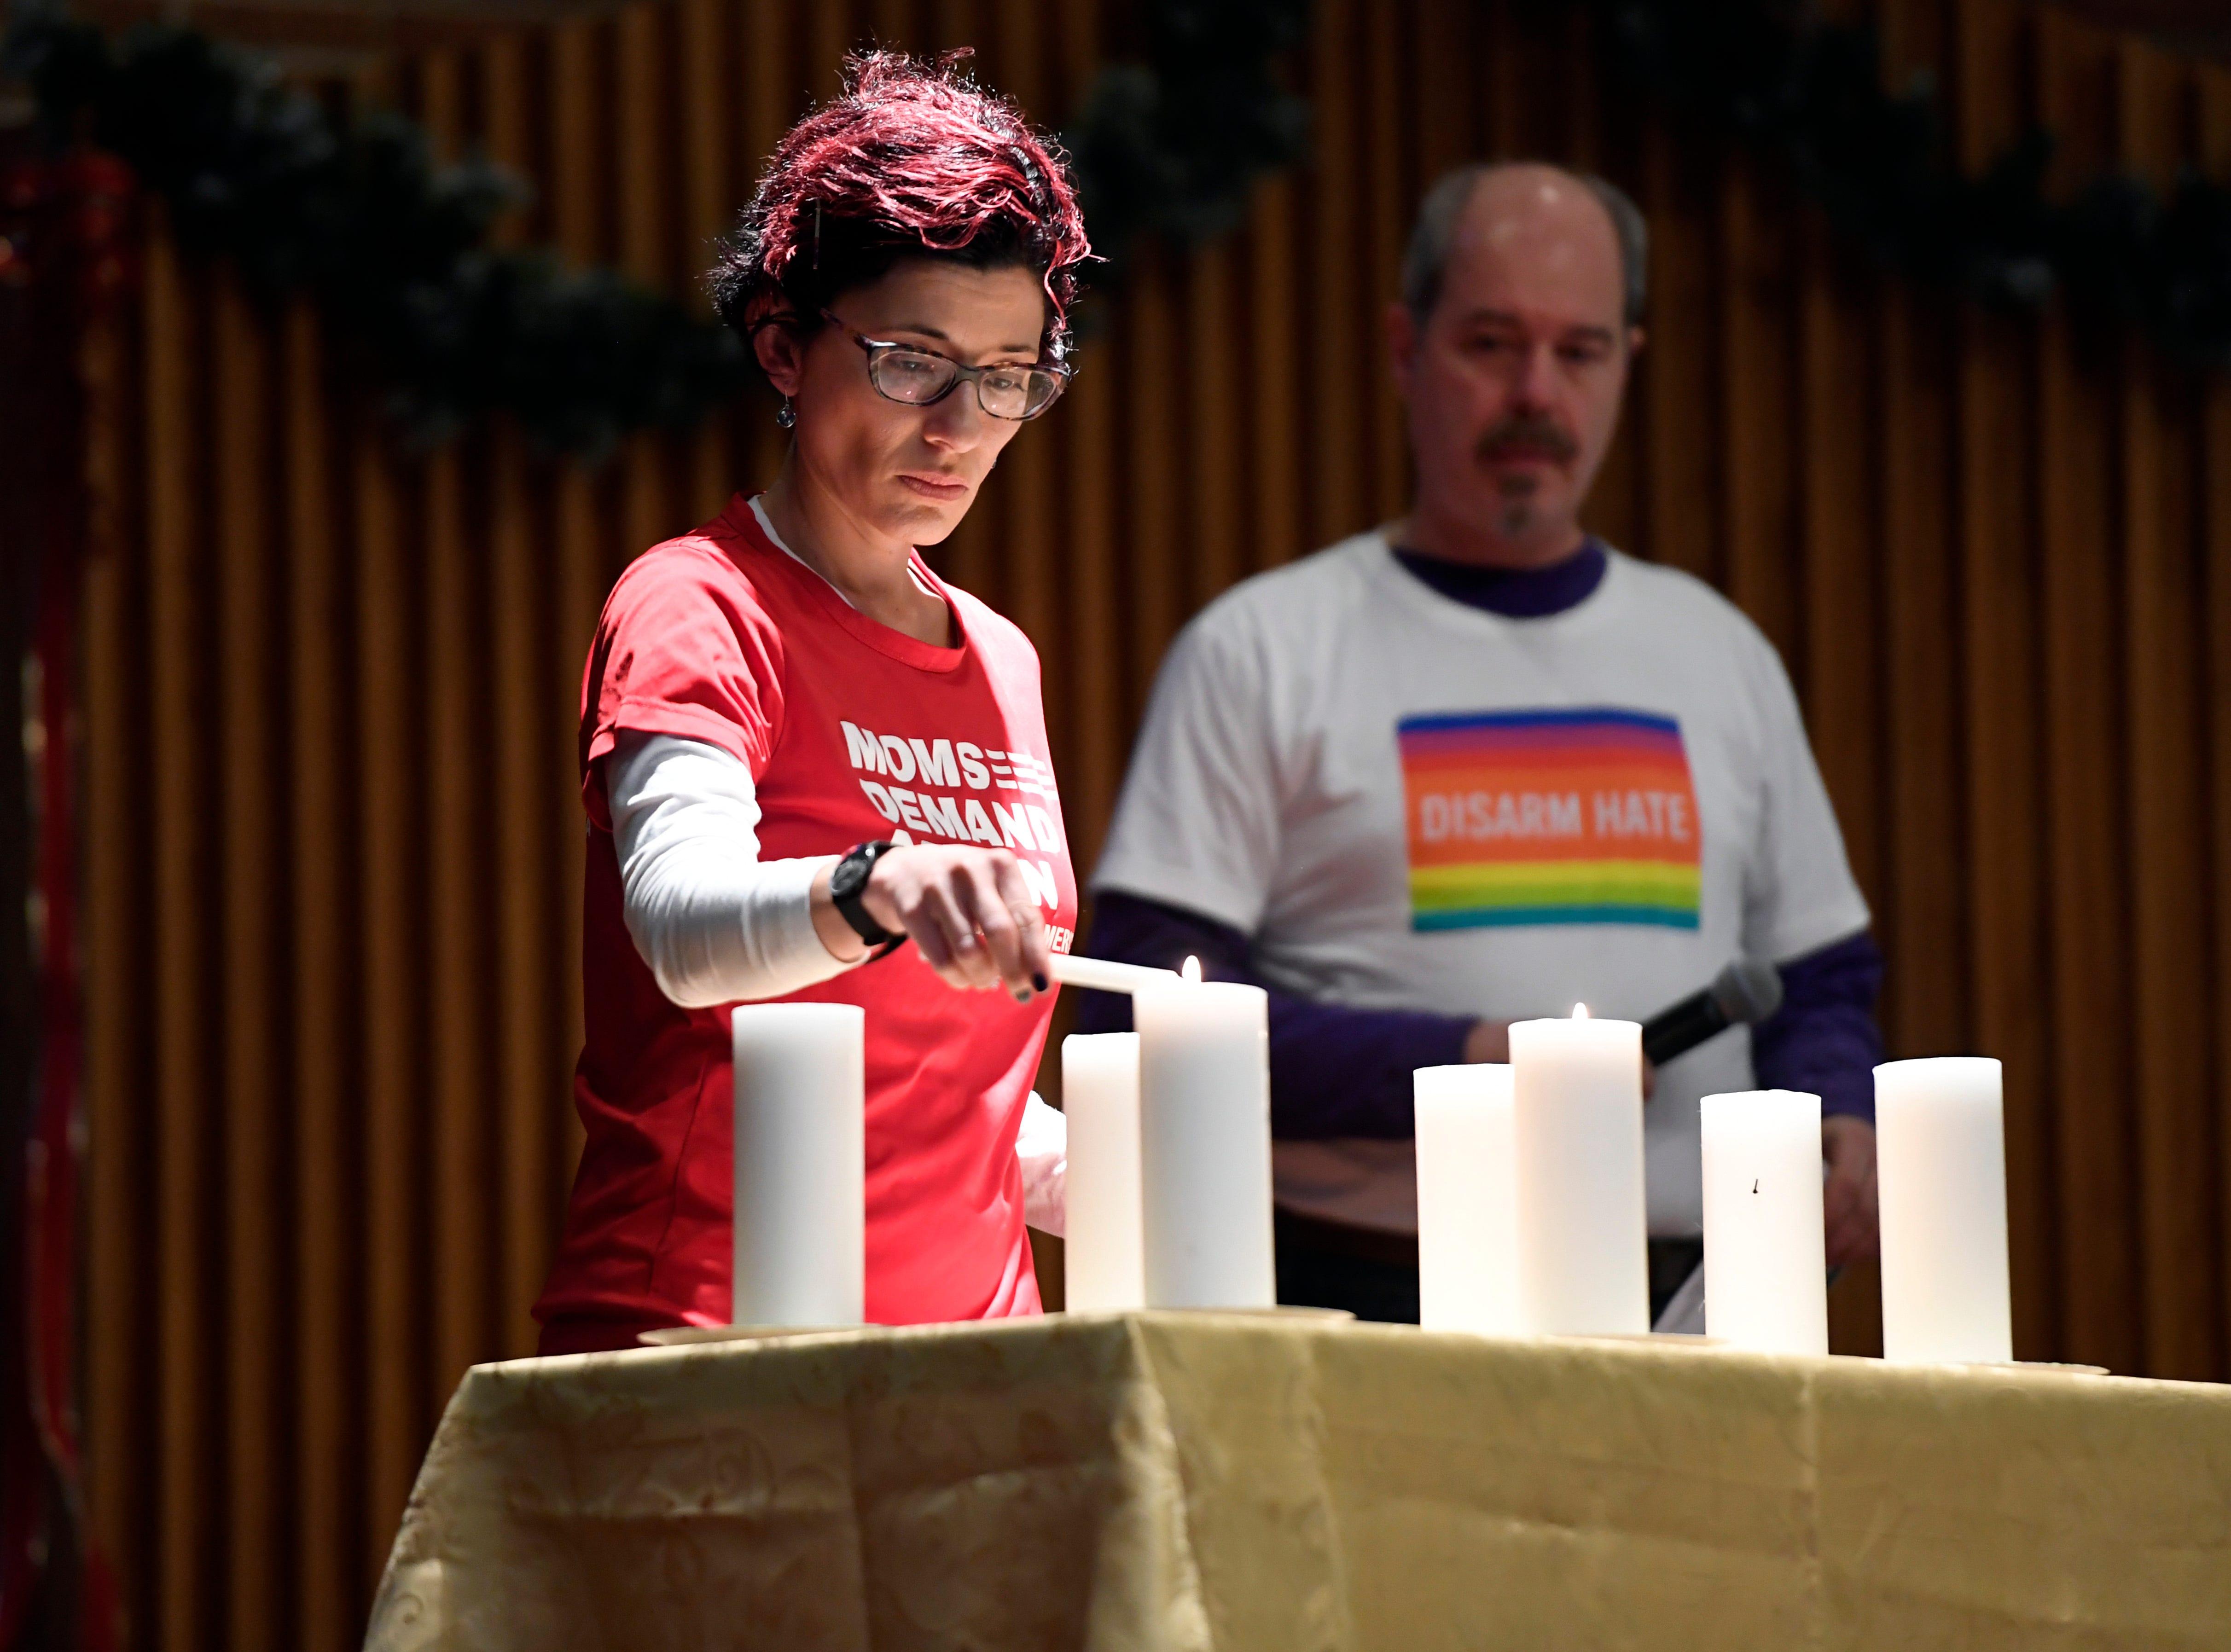 Sandy Hook vigil fosters new sense of hope for gun law advocates